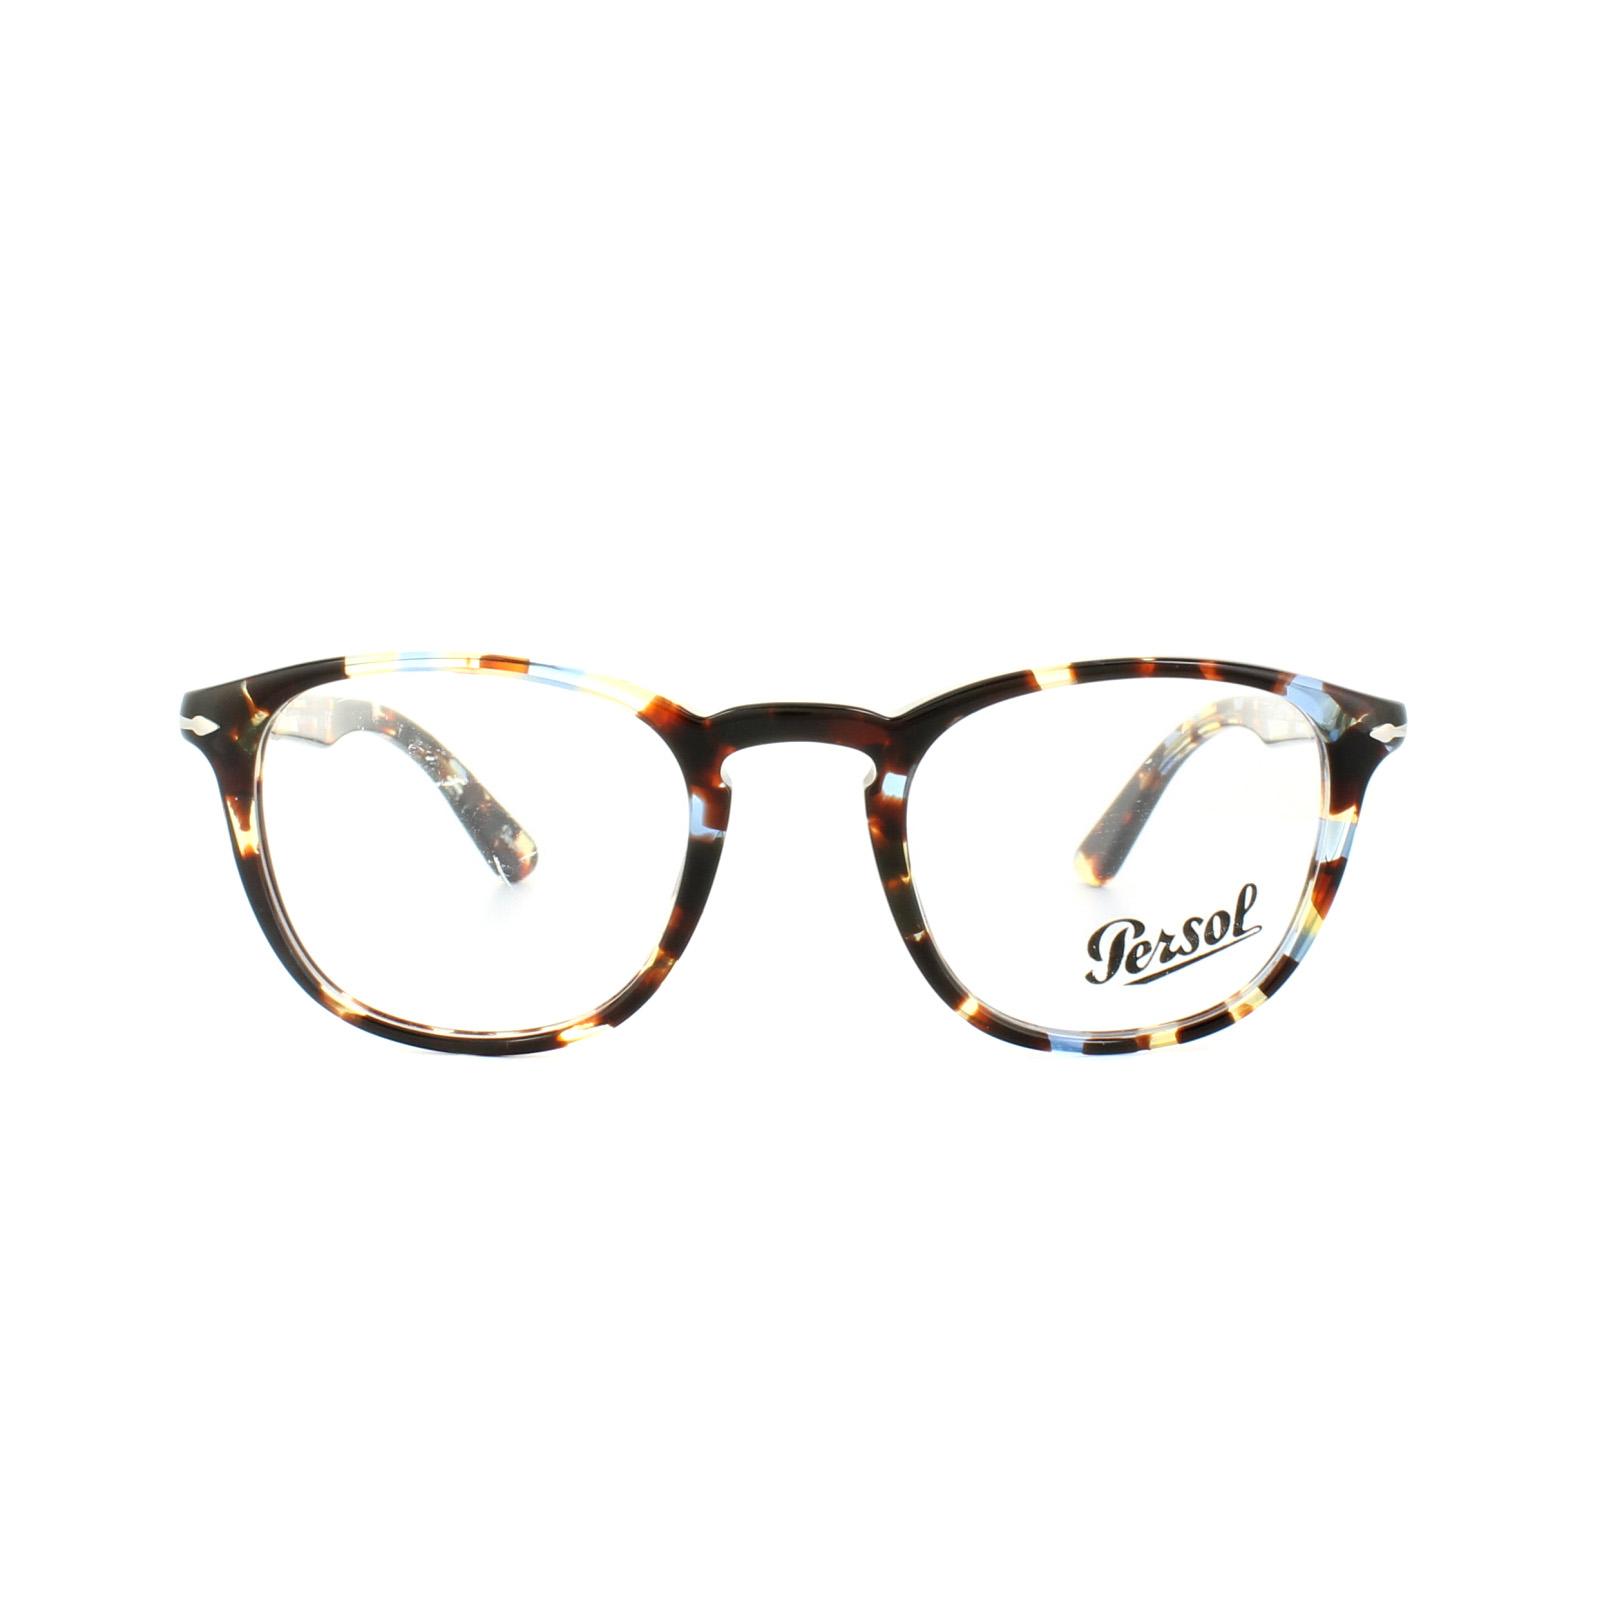 ce4a1743cc Cheap Persol PO 3143V Glasses Frames - Discounted Sunglasses